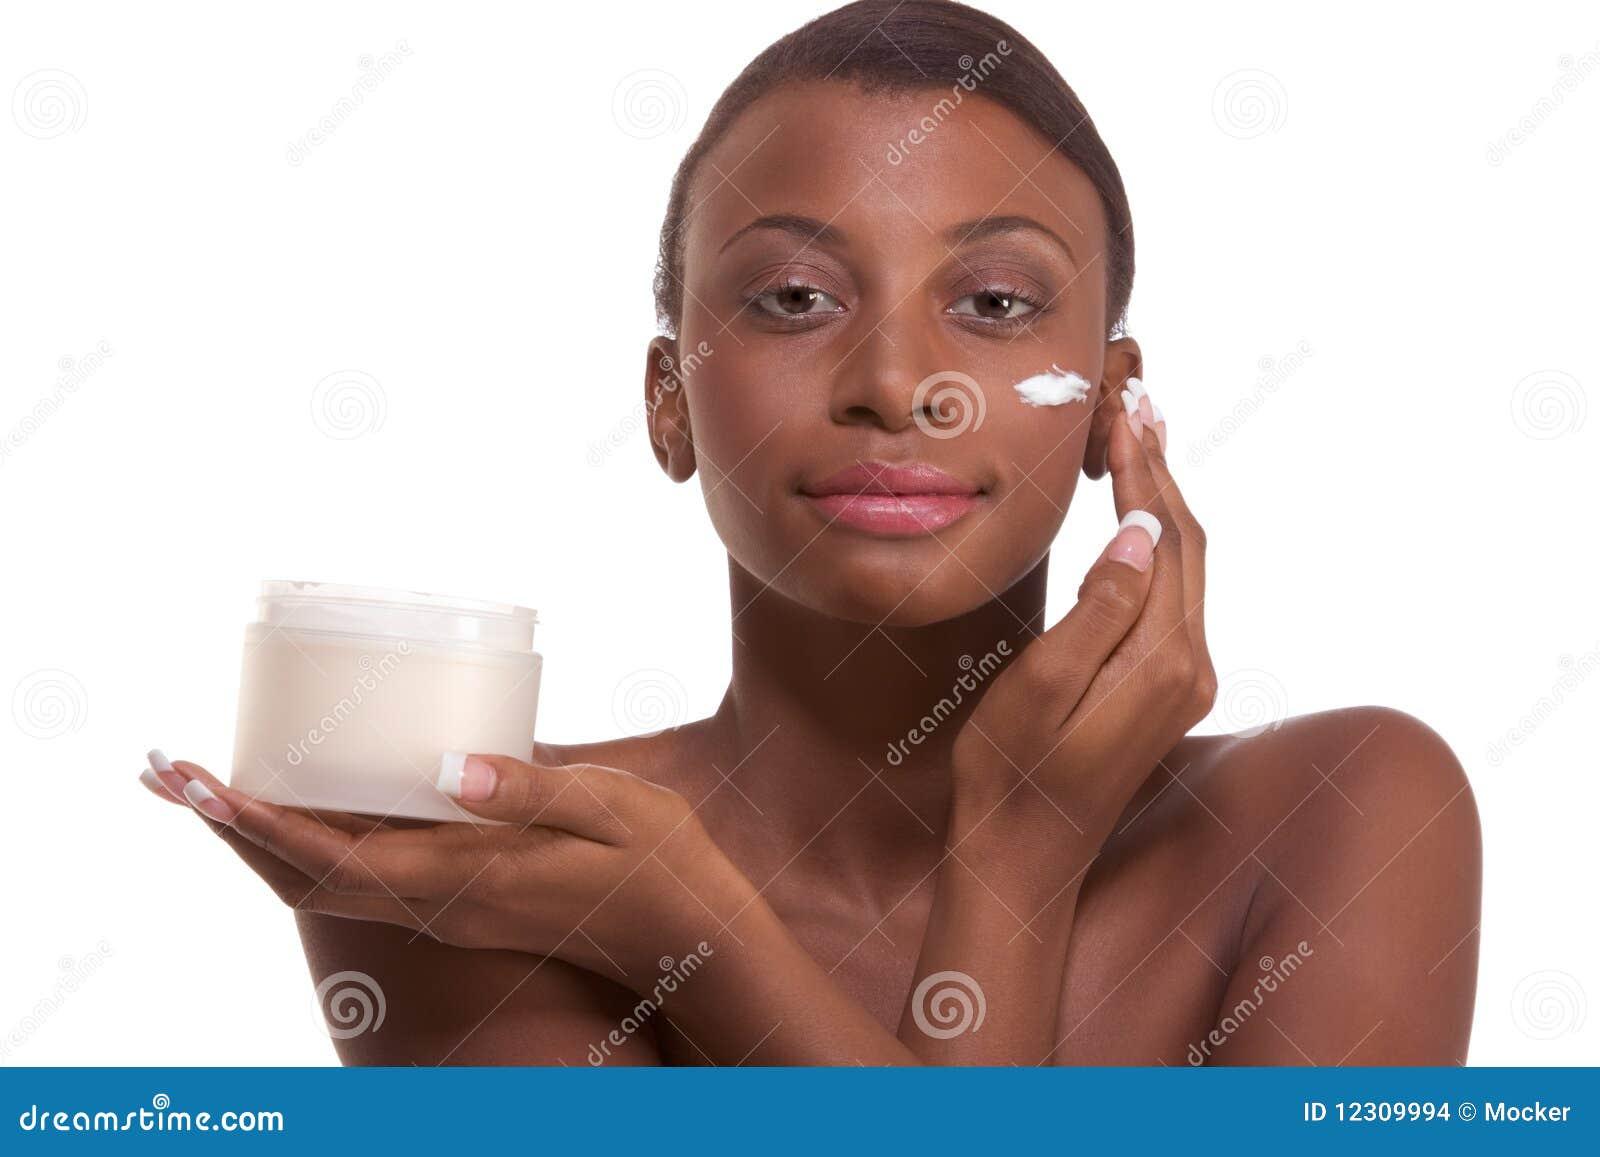 Breast milk breastfeeding man